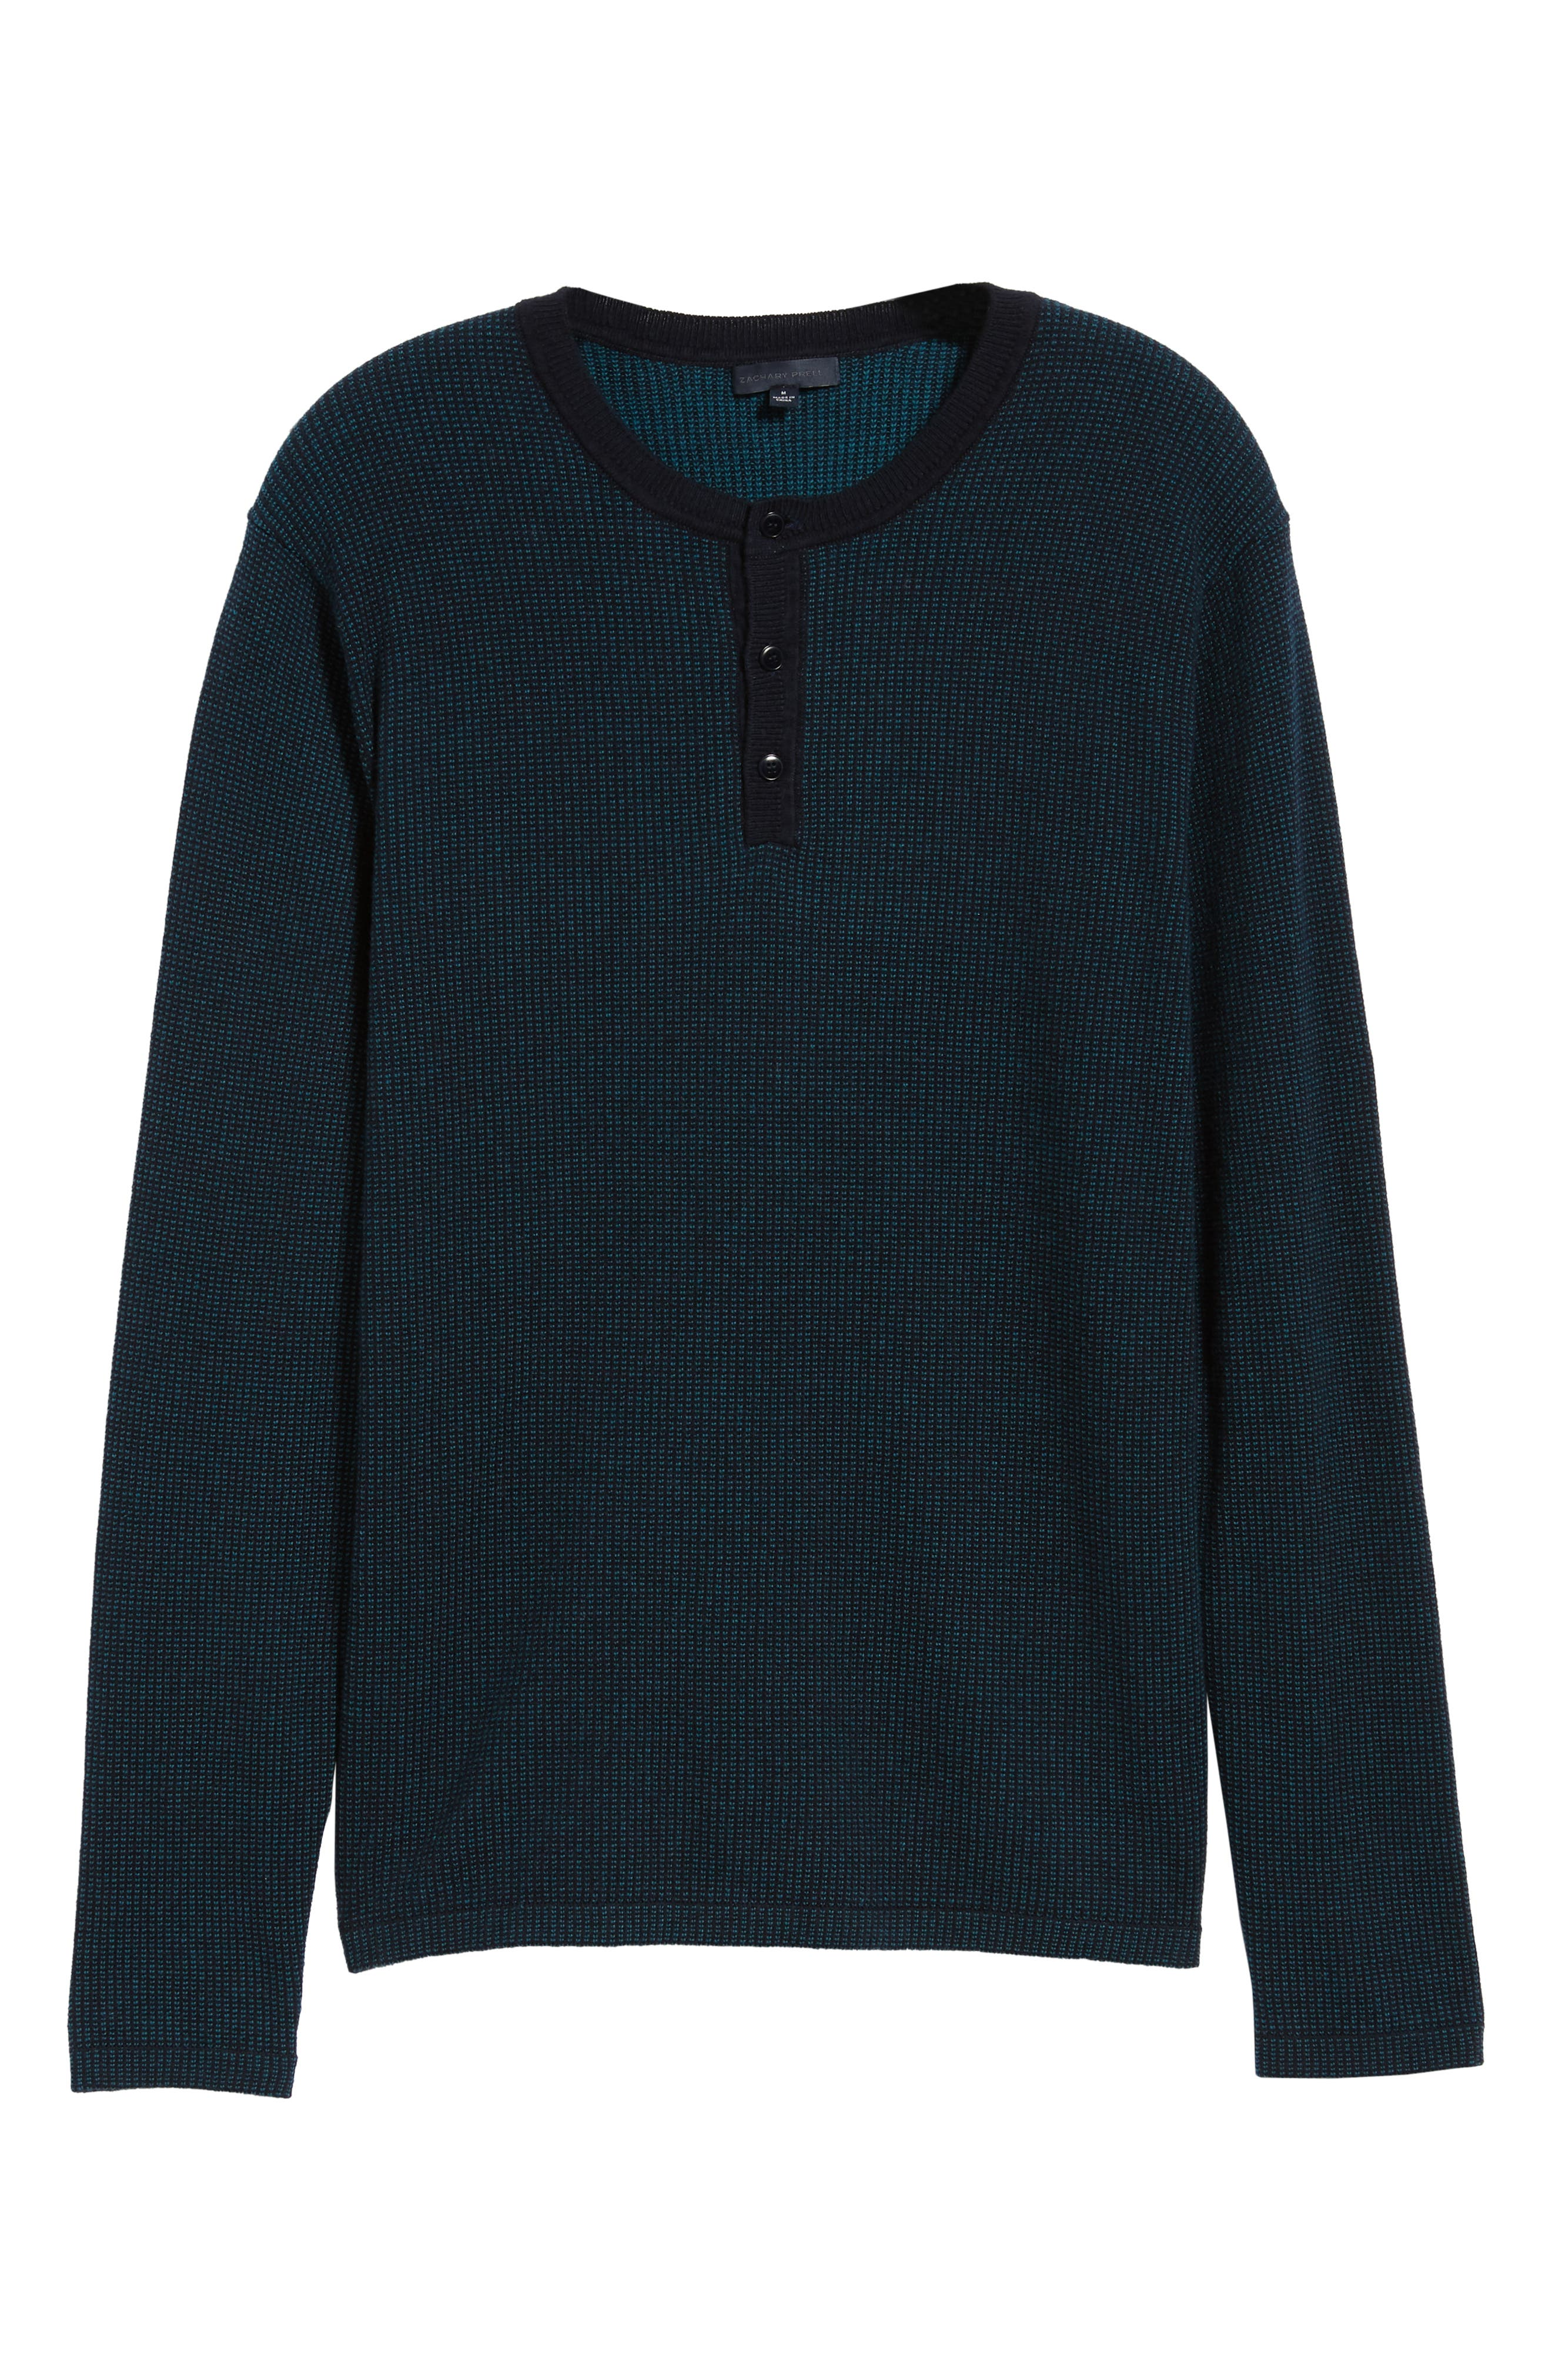 Kimball Henley Sweater,                             Alternate thumbnail 6, color,                             EMERALD